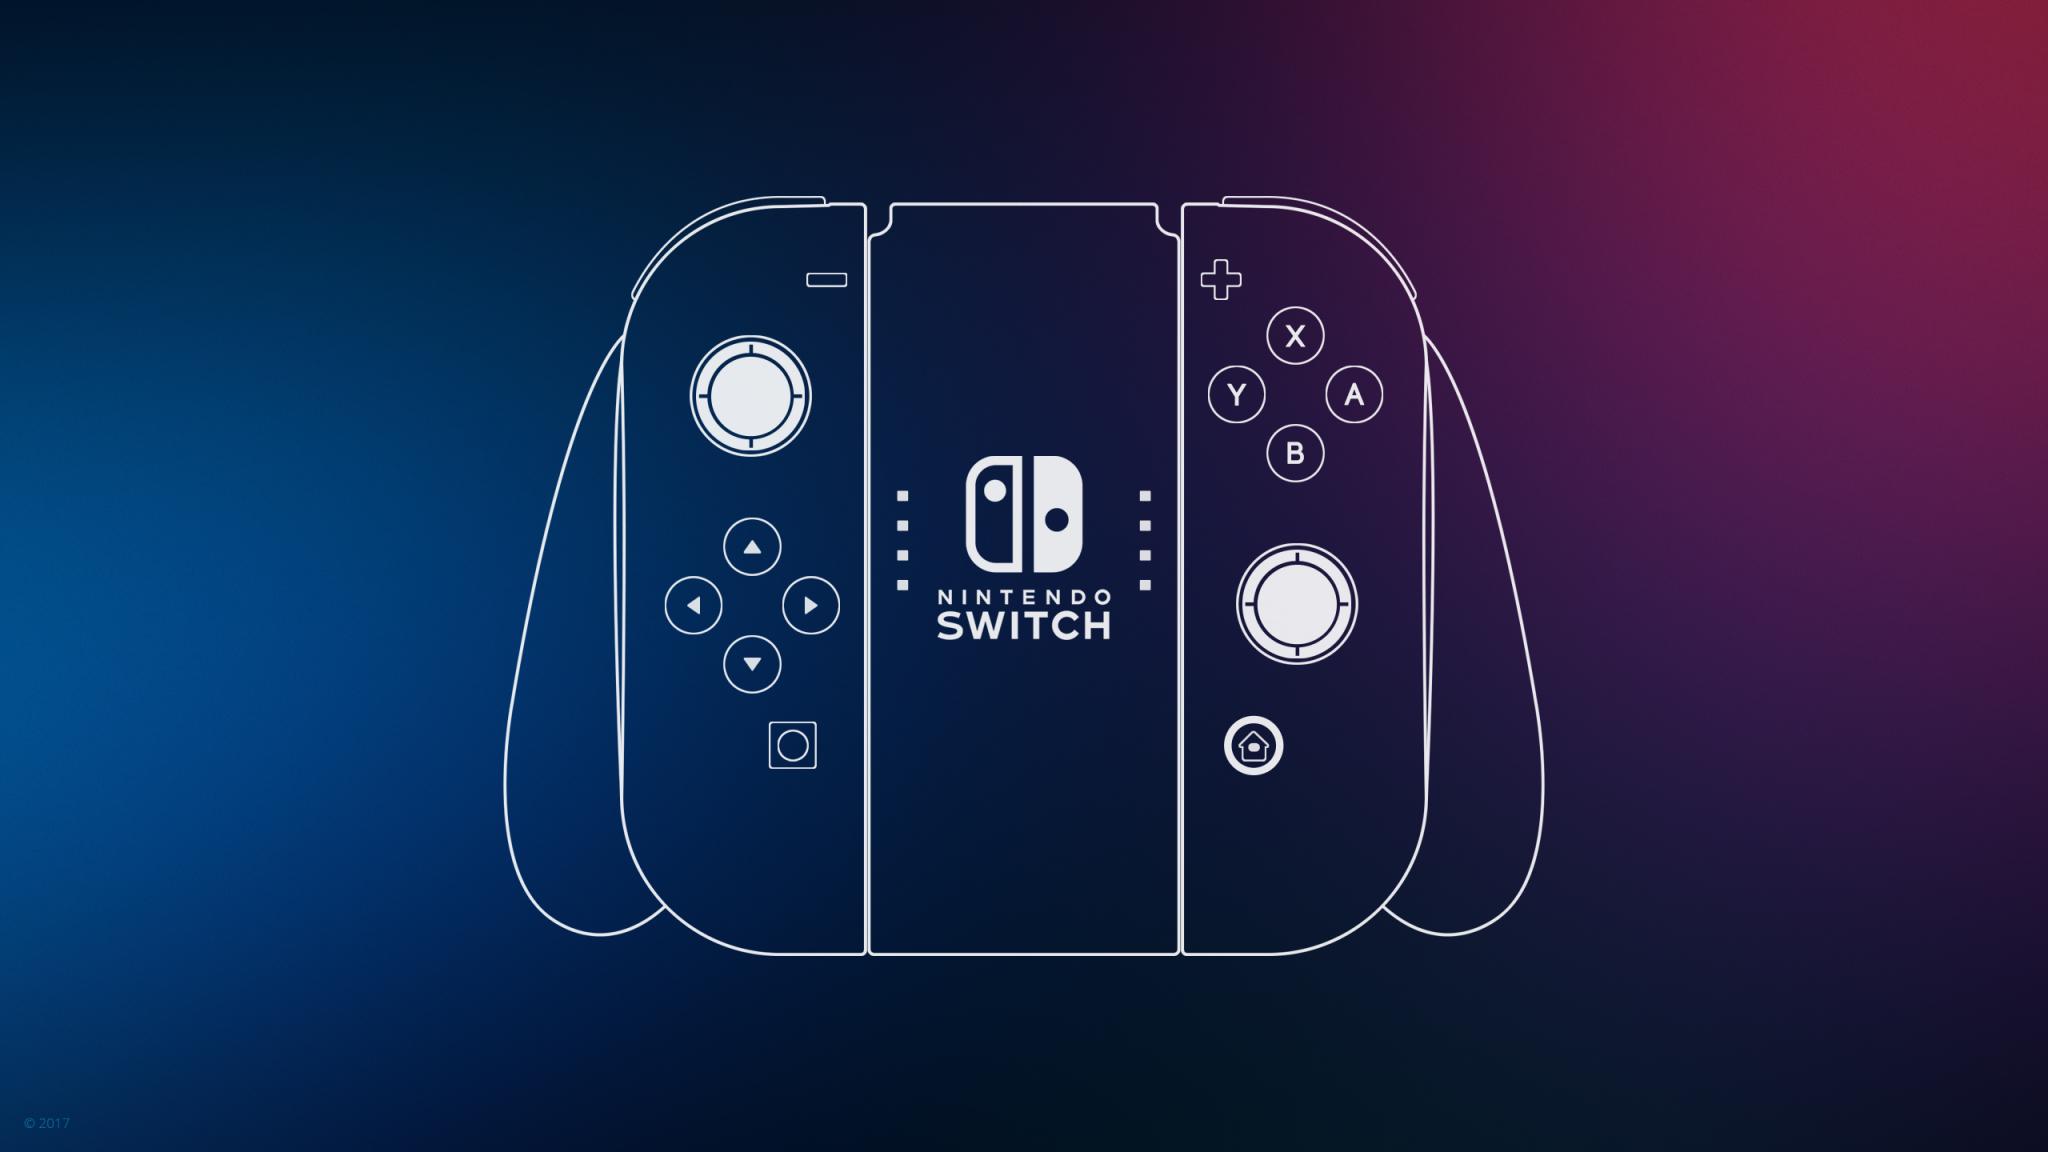 2048x1152 Nintendo Switch Controller Minimal 2048x1152 ...